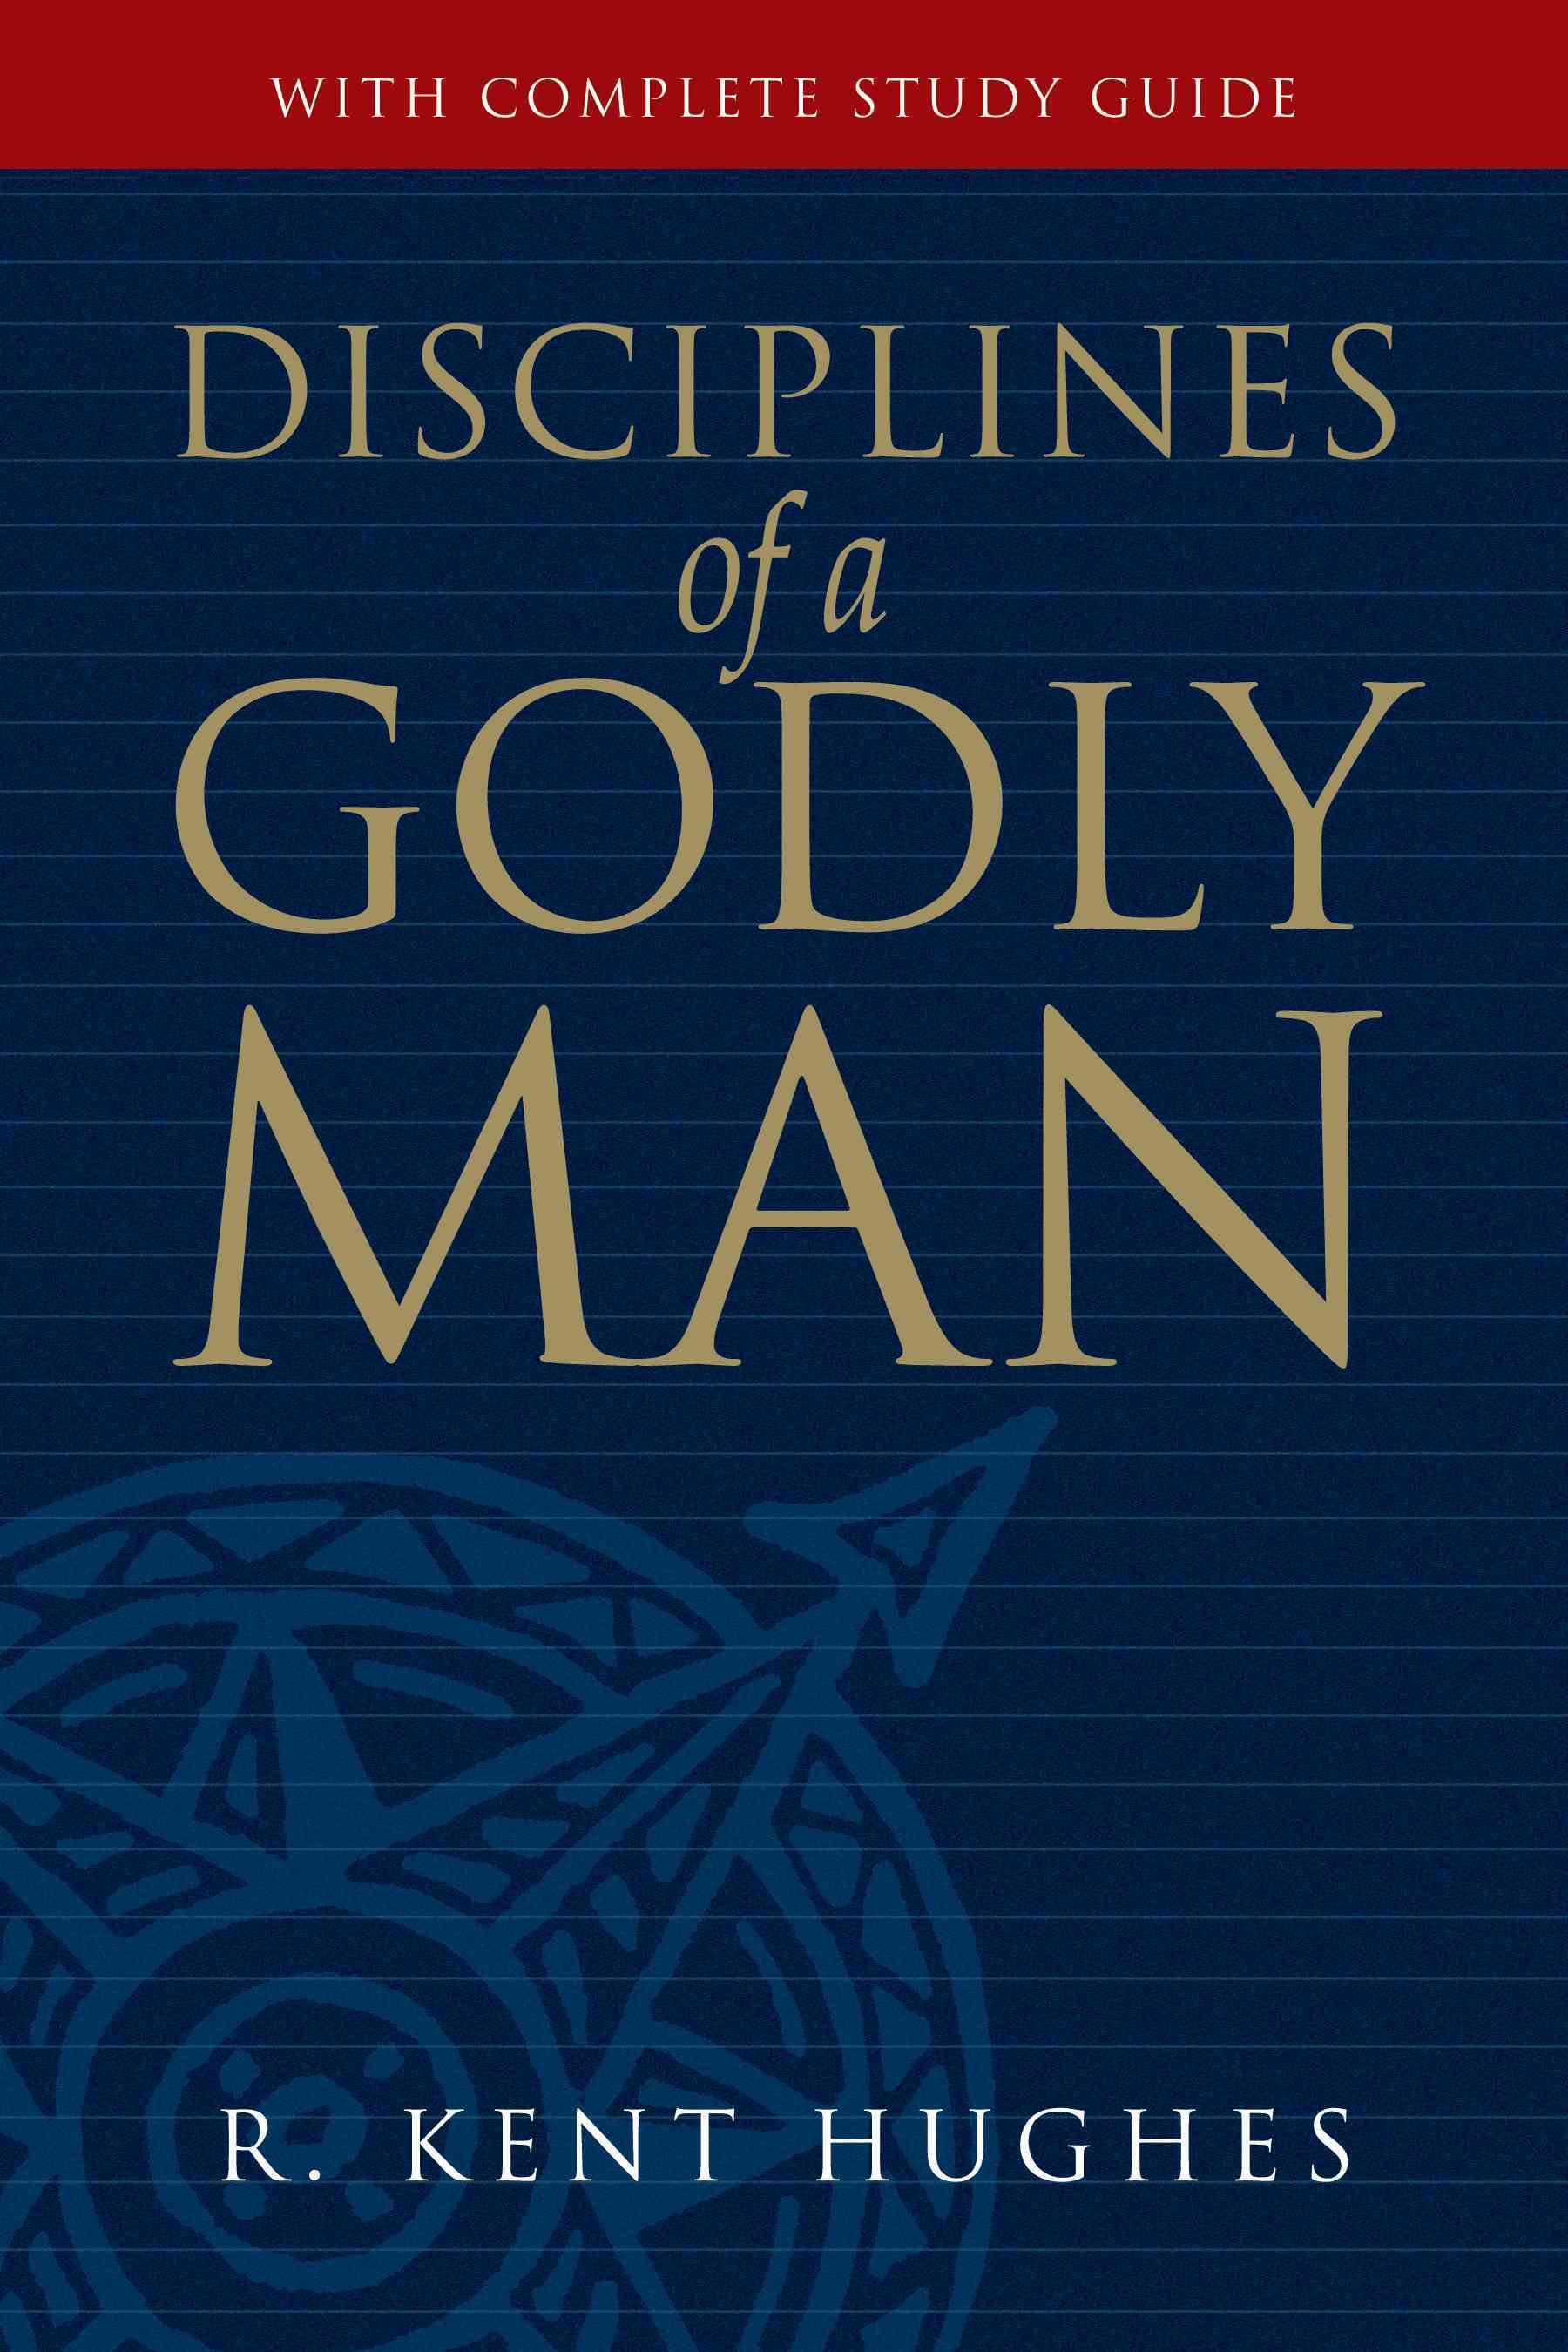 Disciplines of a Godly Man (Paperback)